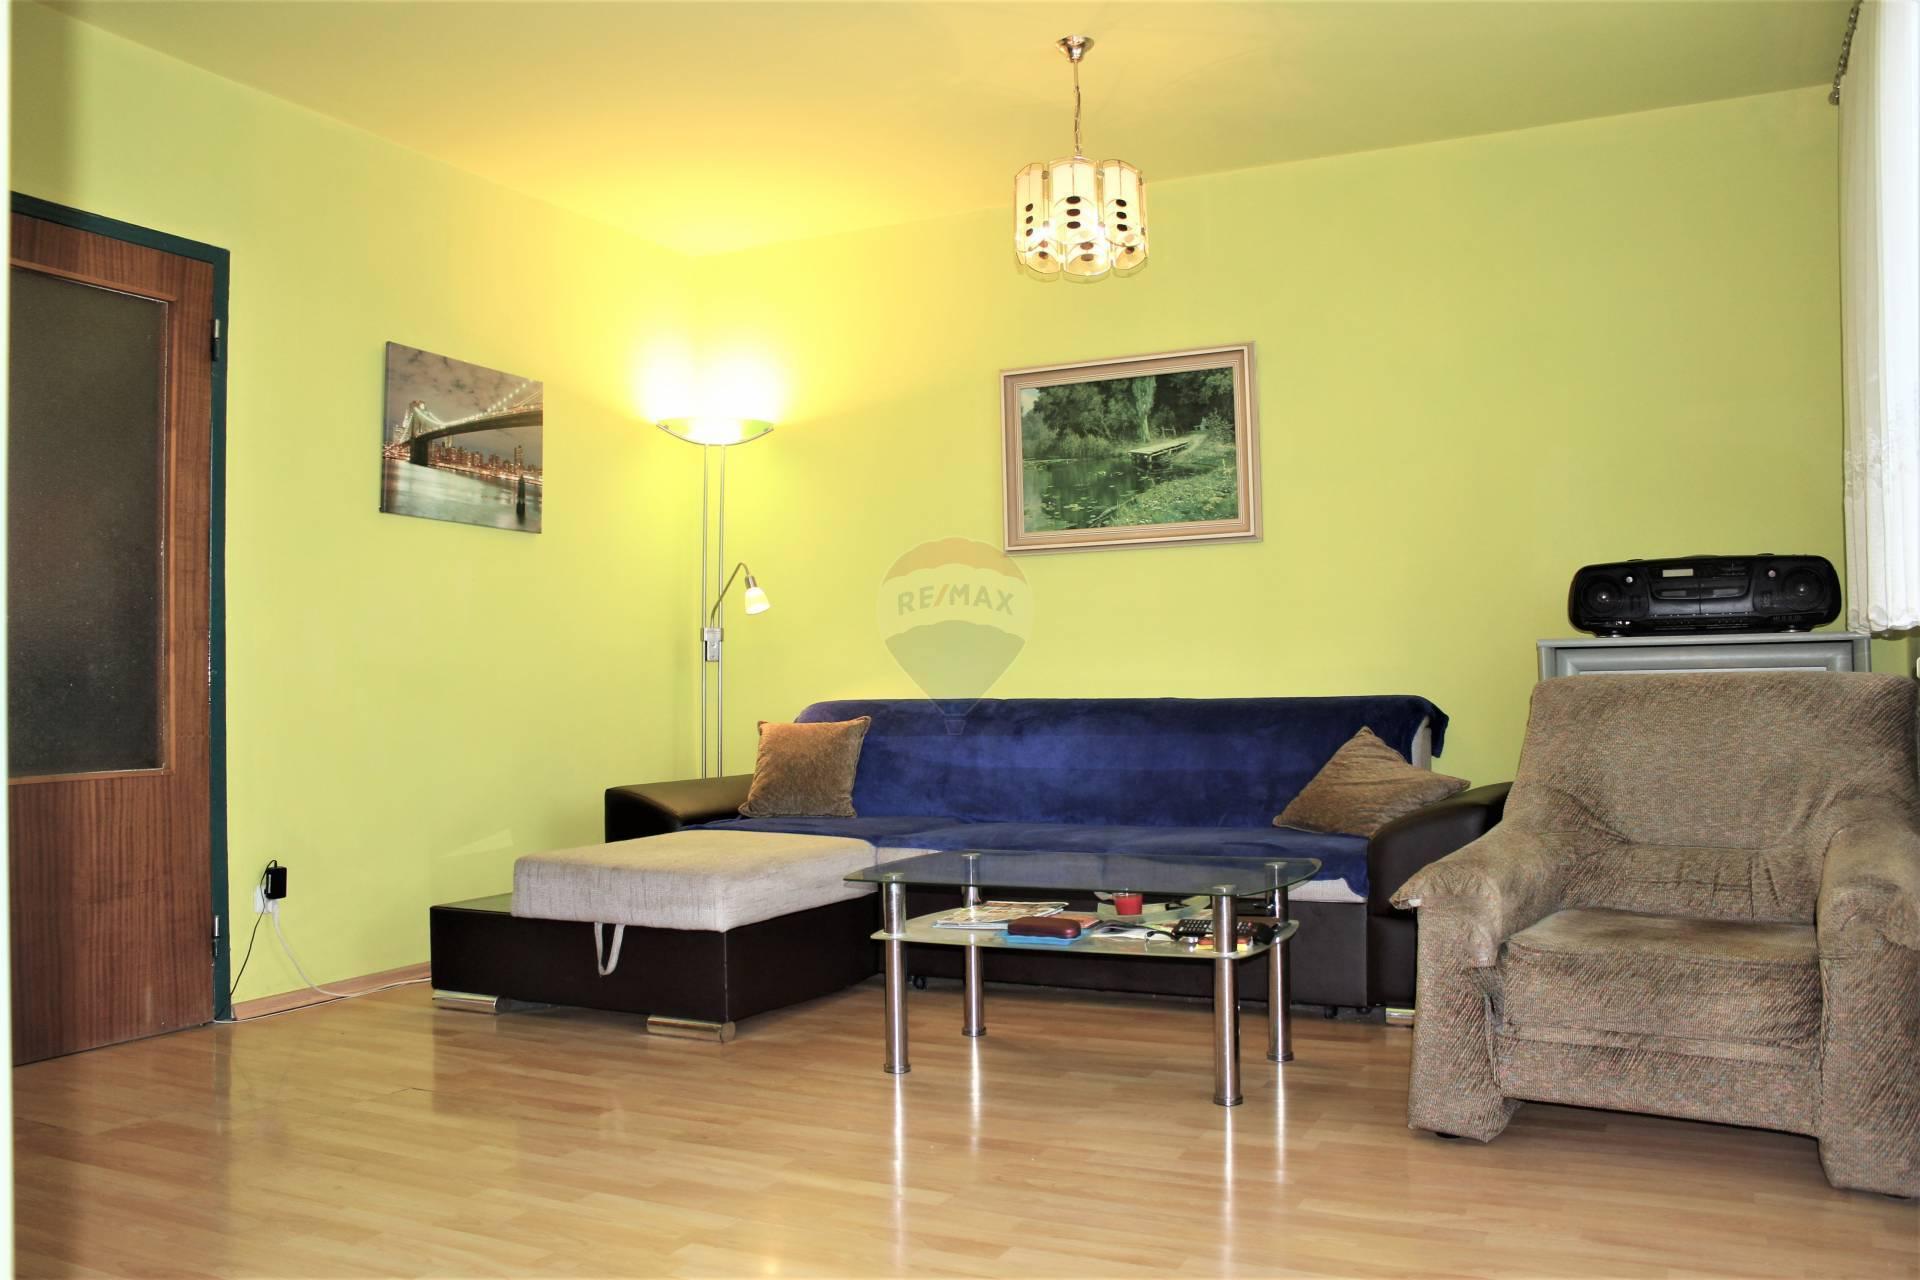 =RE/MAX= Na predaj príjemný 3 izbový byt, bauring, Družba, Clementisova